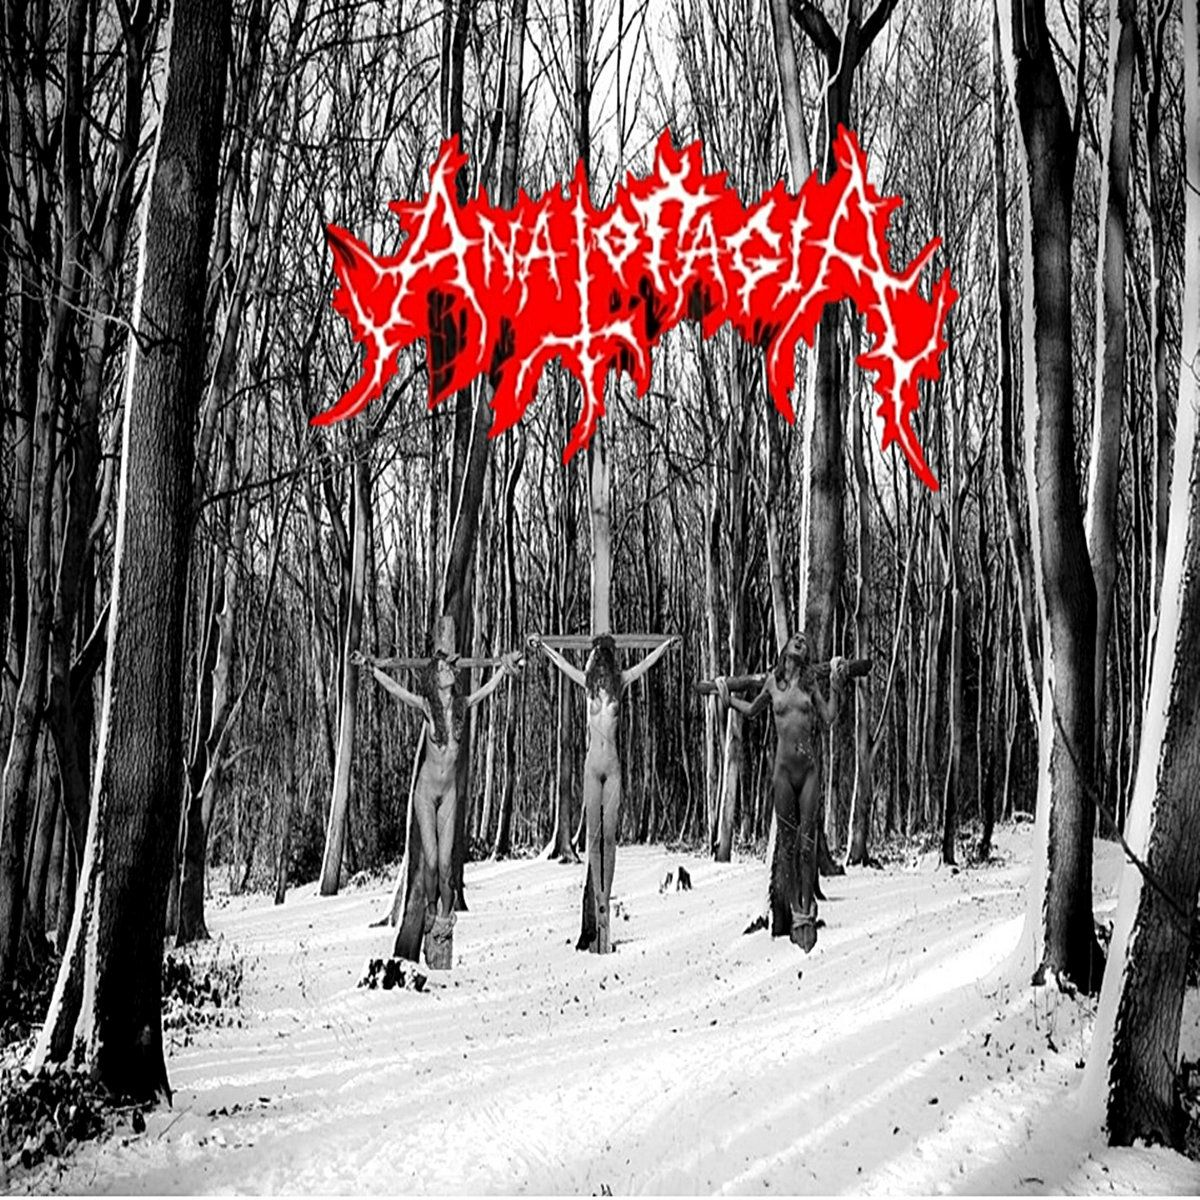 Anatofagia - Crudo